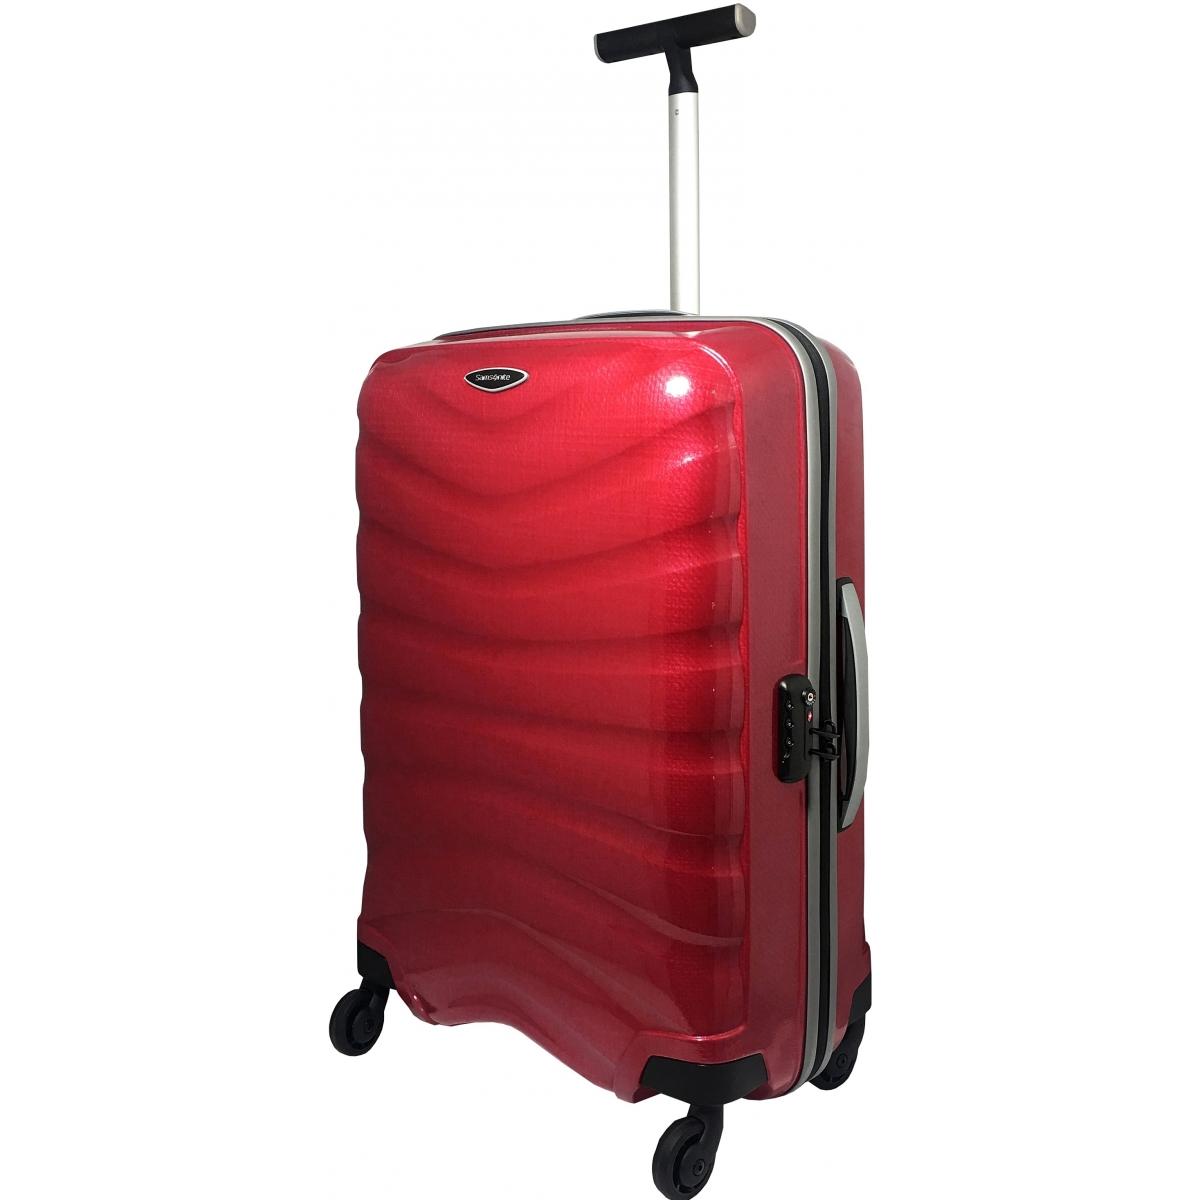 valise samsonite firelite spinner 69 cm taille m rouge firelite80 couleur principale. Black Bedroom Furniture Sets. Home Design Ideas